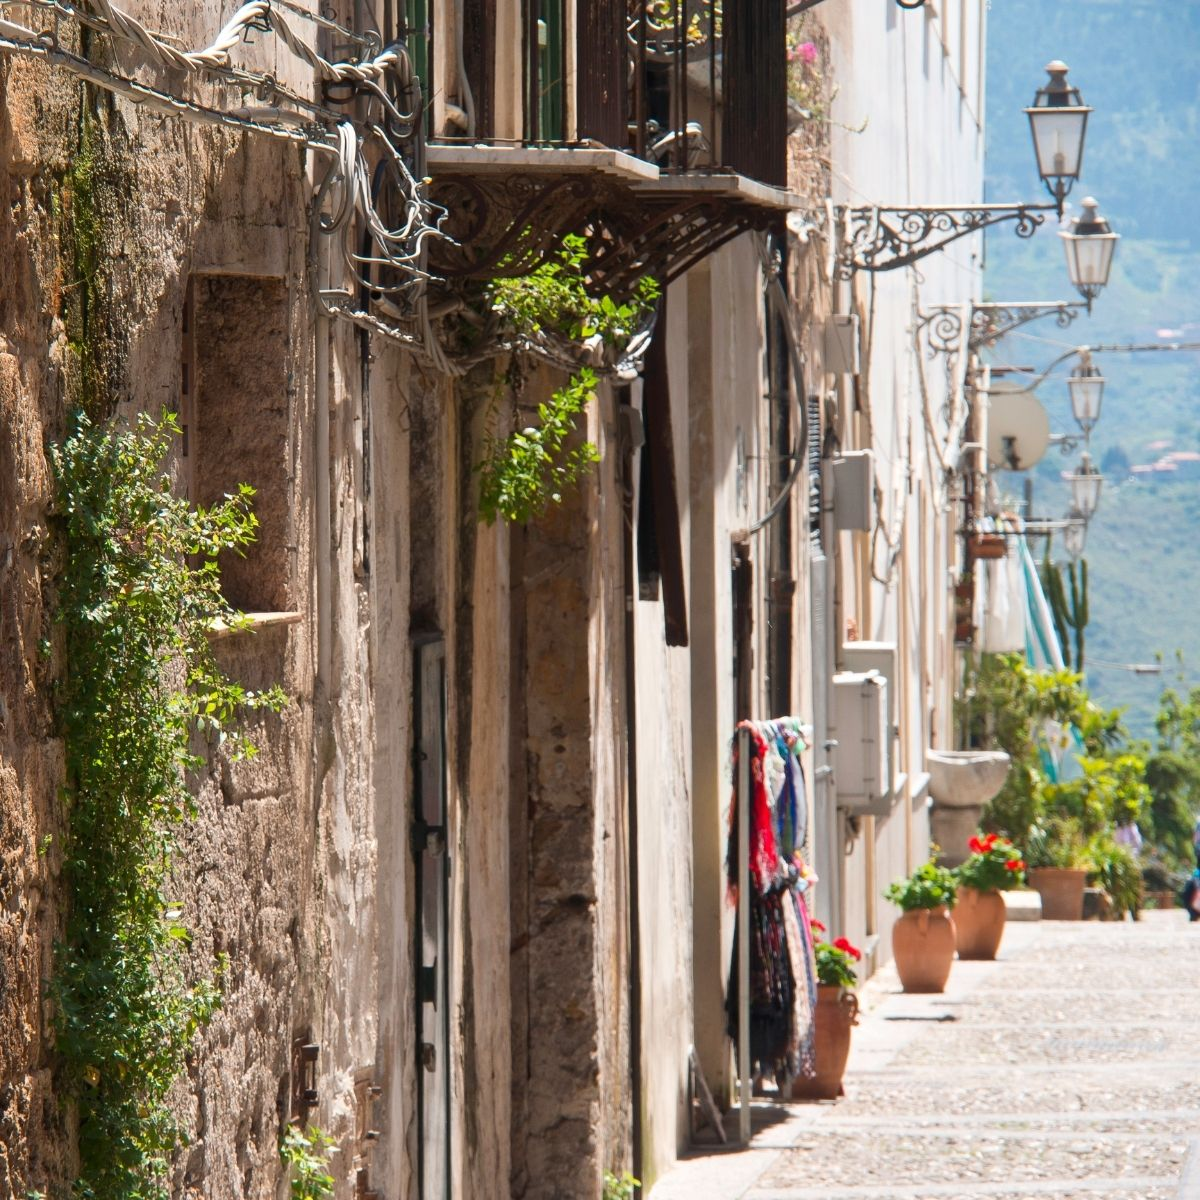 casas en itala por 1 euro son reales donde comprar 2